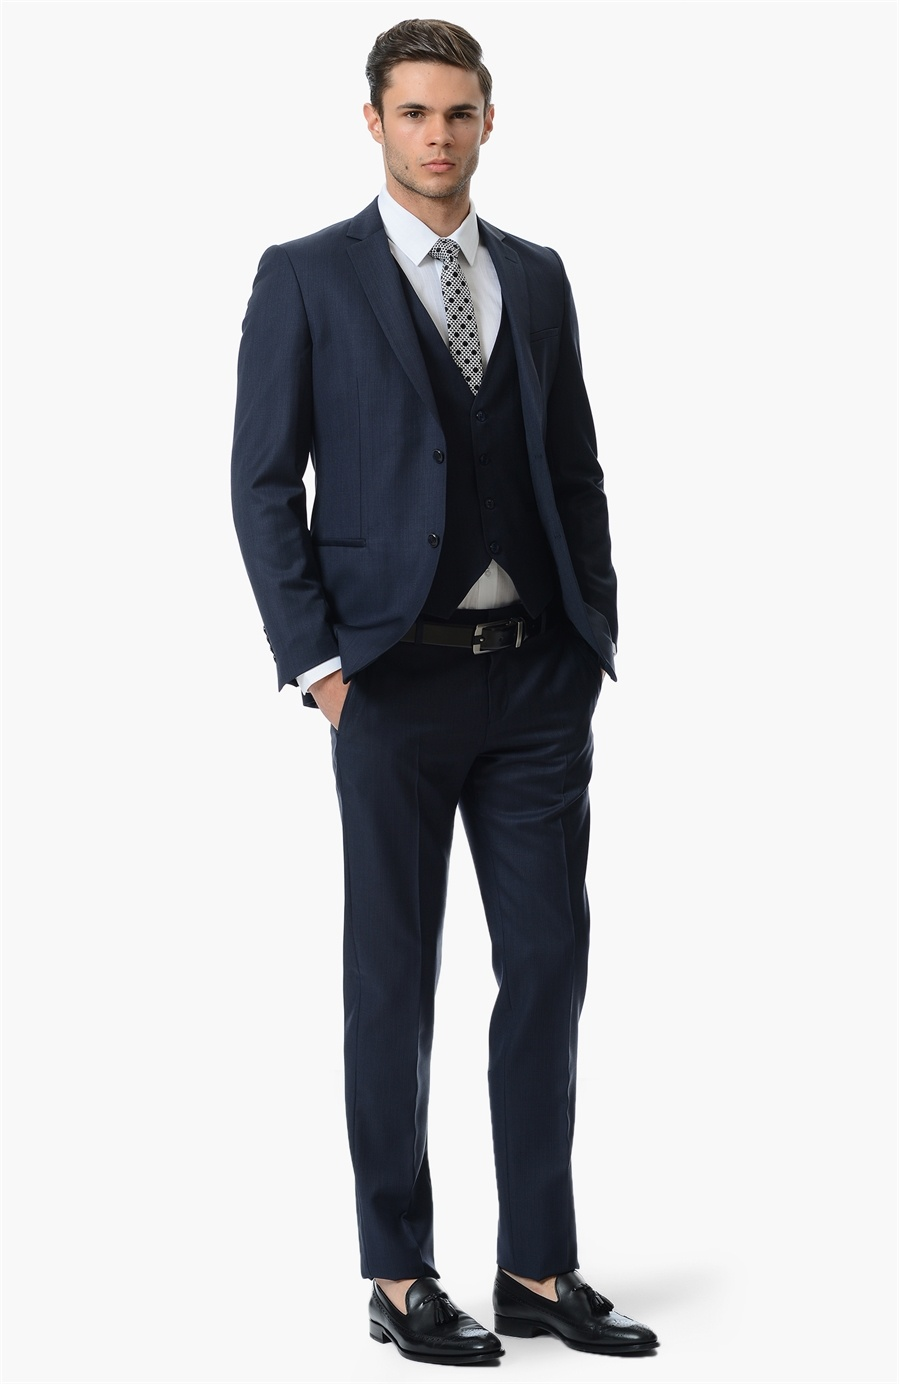 Lacivert Yelekli Takım Elbise 2019